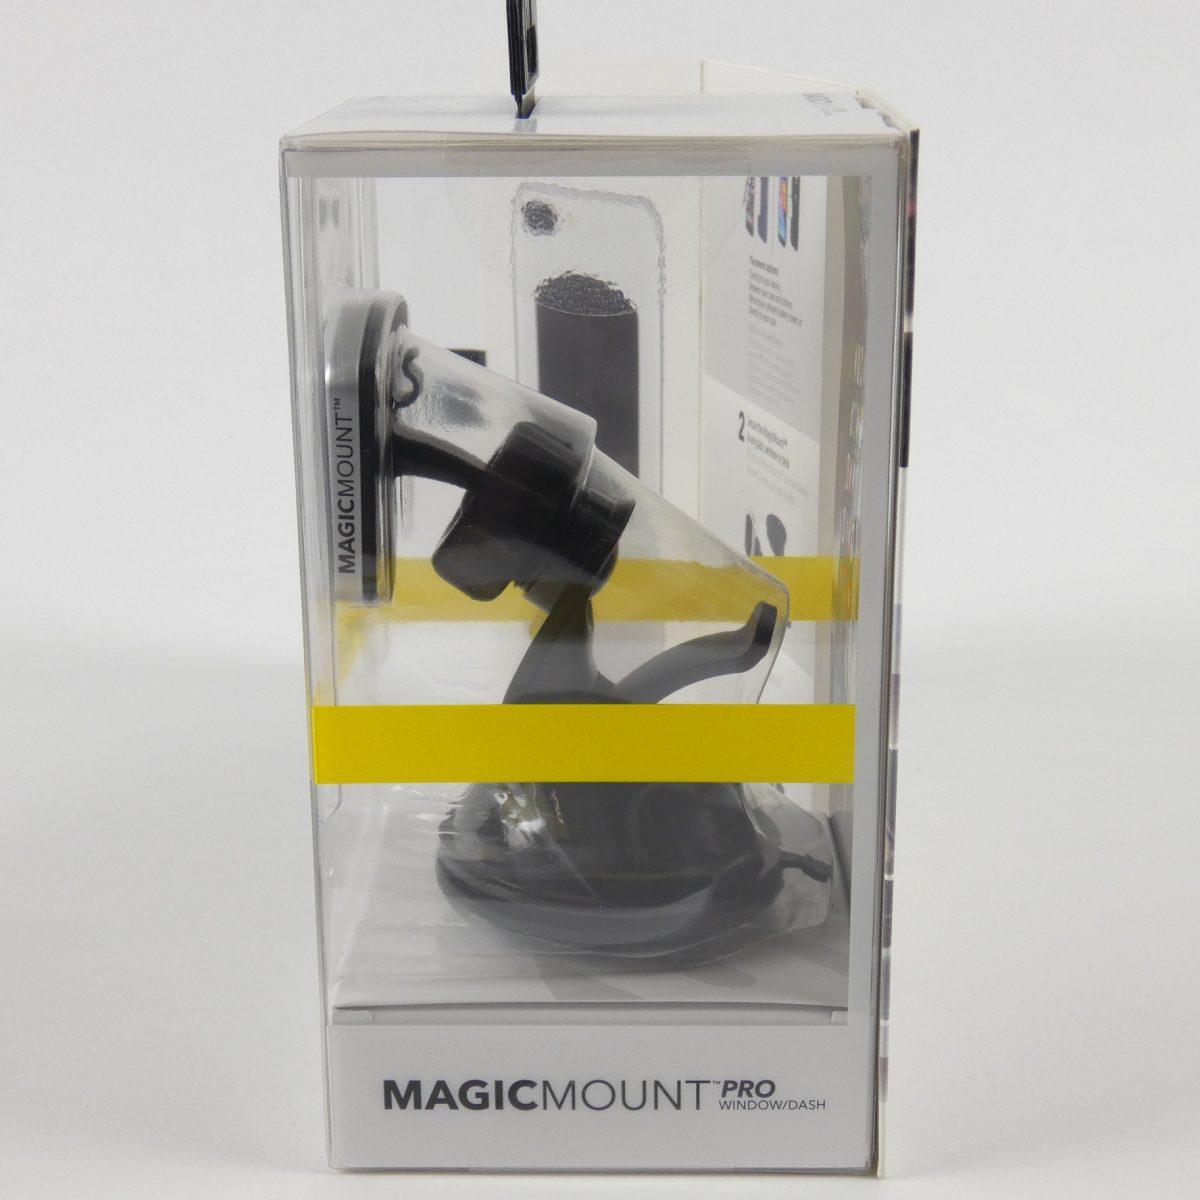 Kwaliteitshouder Magicmount sterke magneet